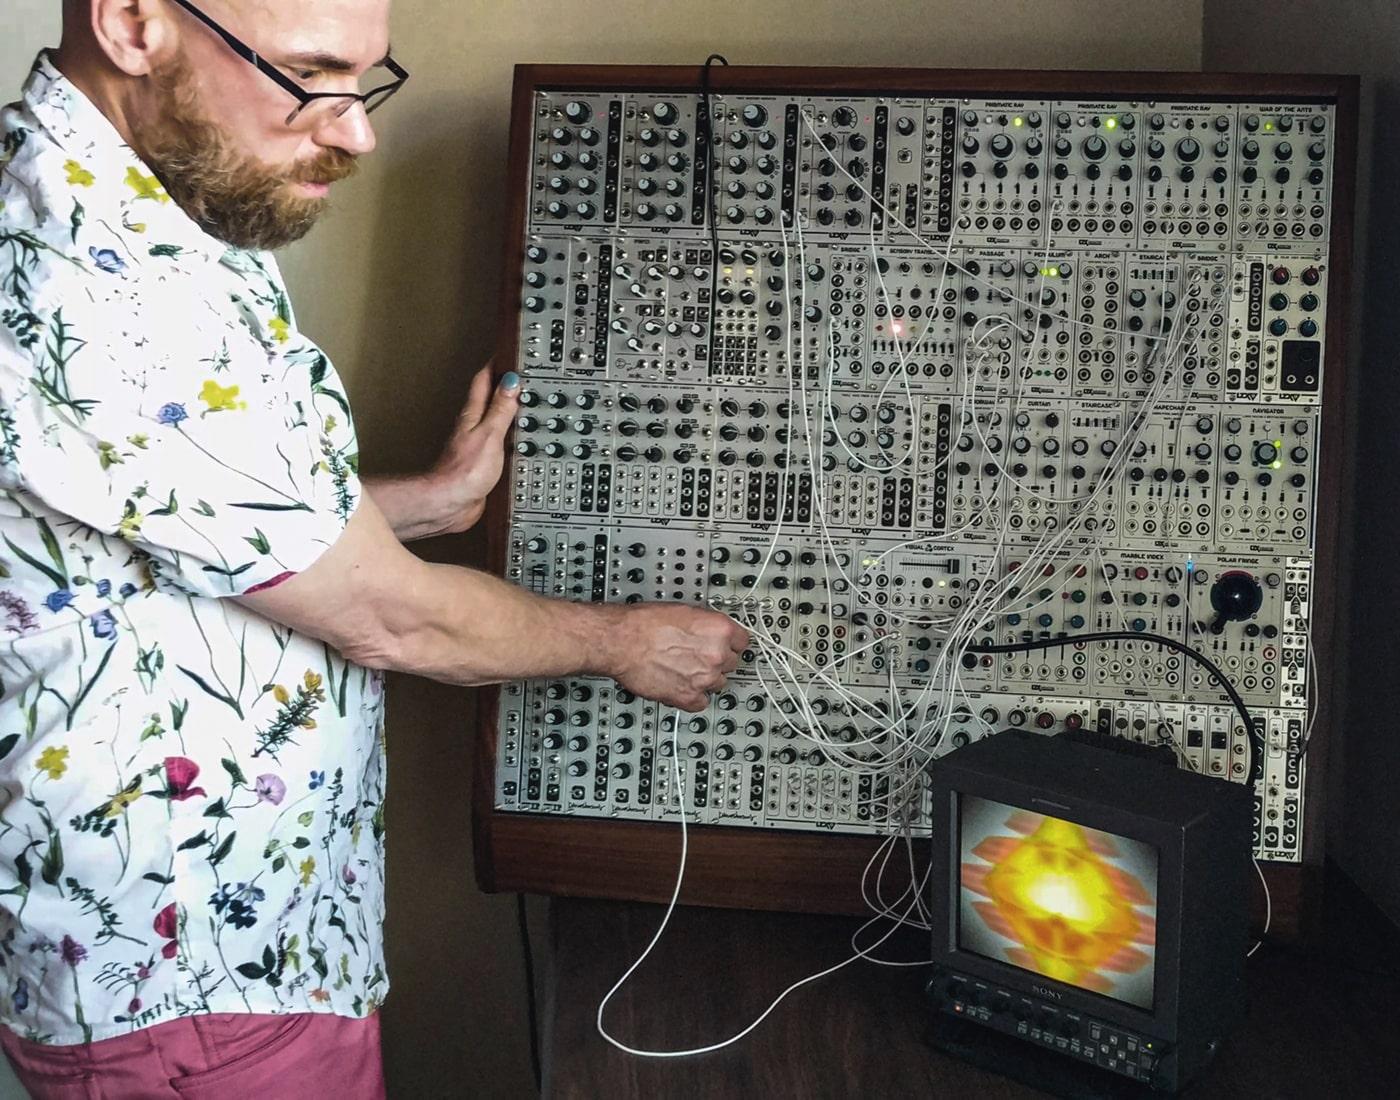 Benton C Bainbridge operating his video synth.